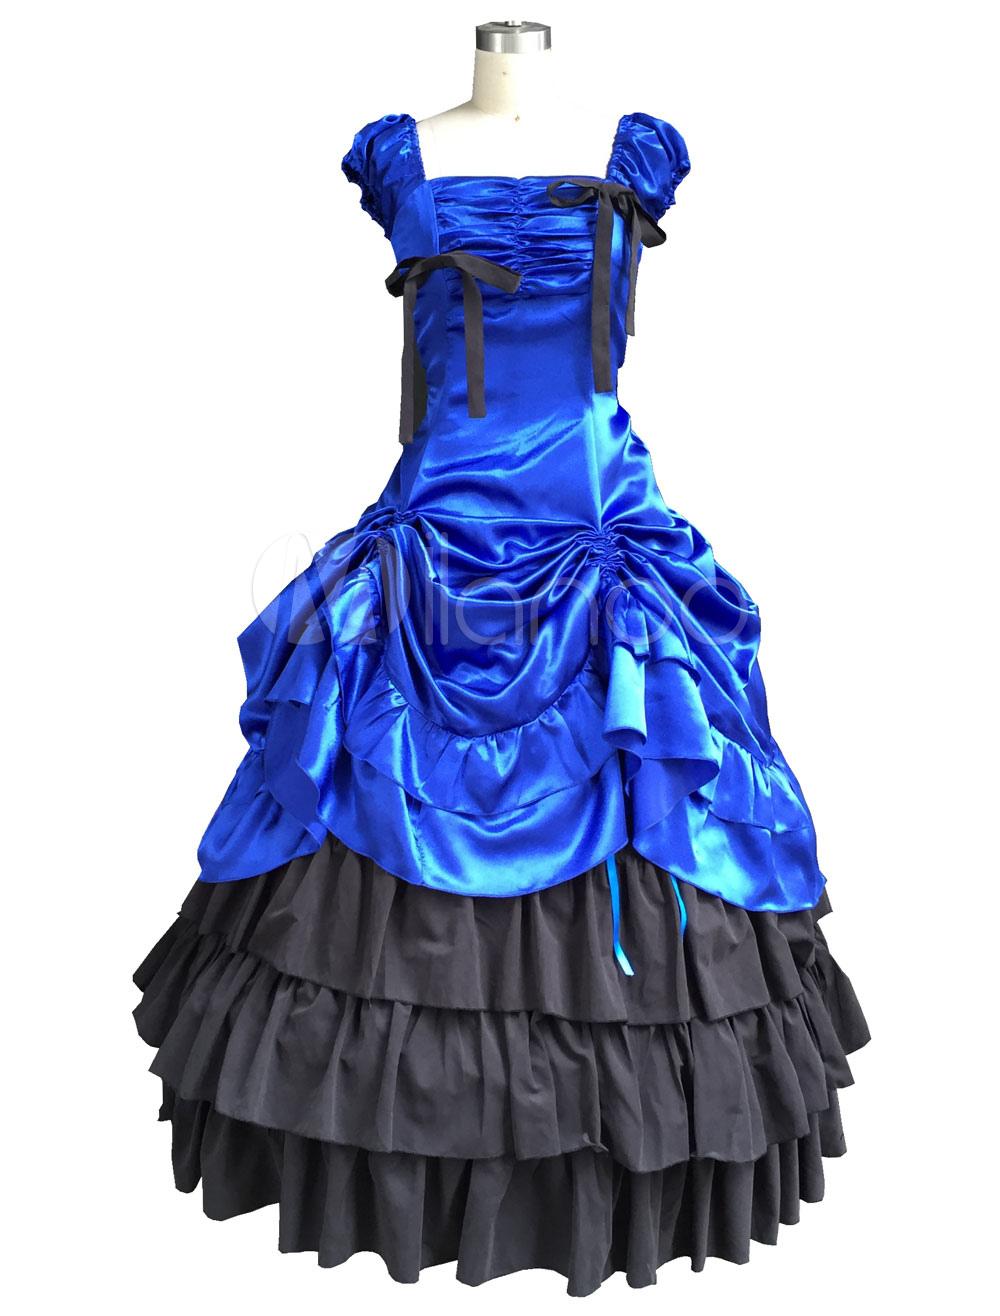 Elegant Peacock Blue Satin Lolita One-piece Dress Sleeveless Ruffles Waist Belt Lace Bow